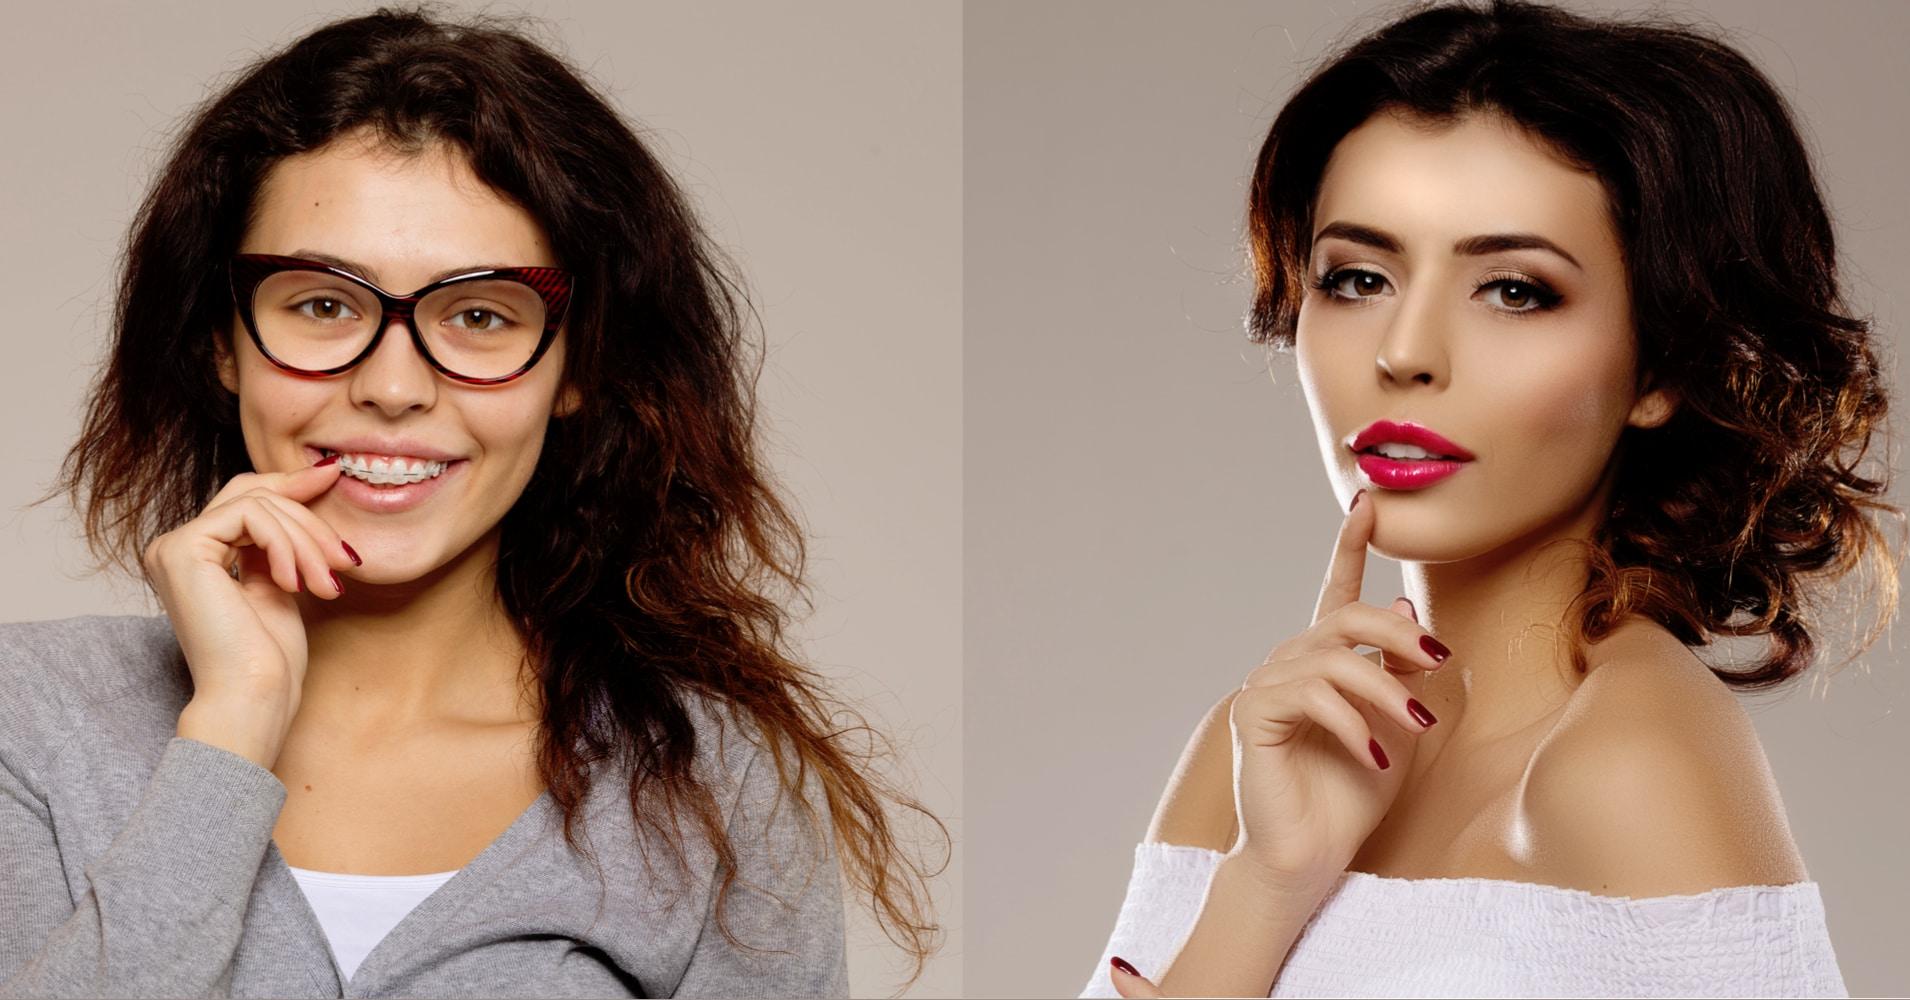 Am I Beautiful Or Ugly? - Quiz - Quizony.com